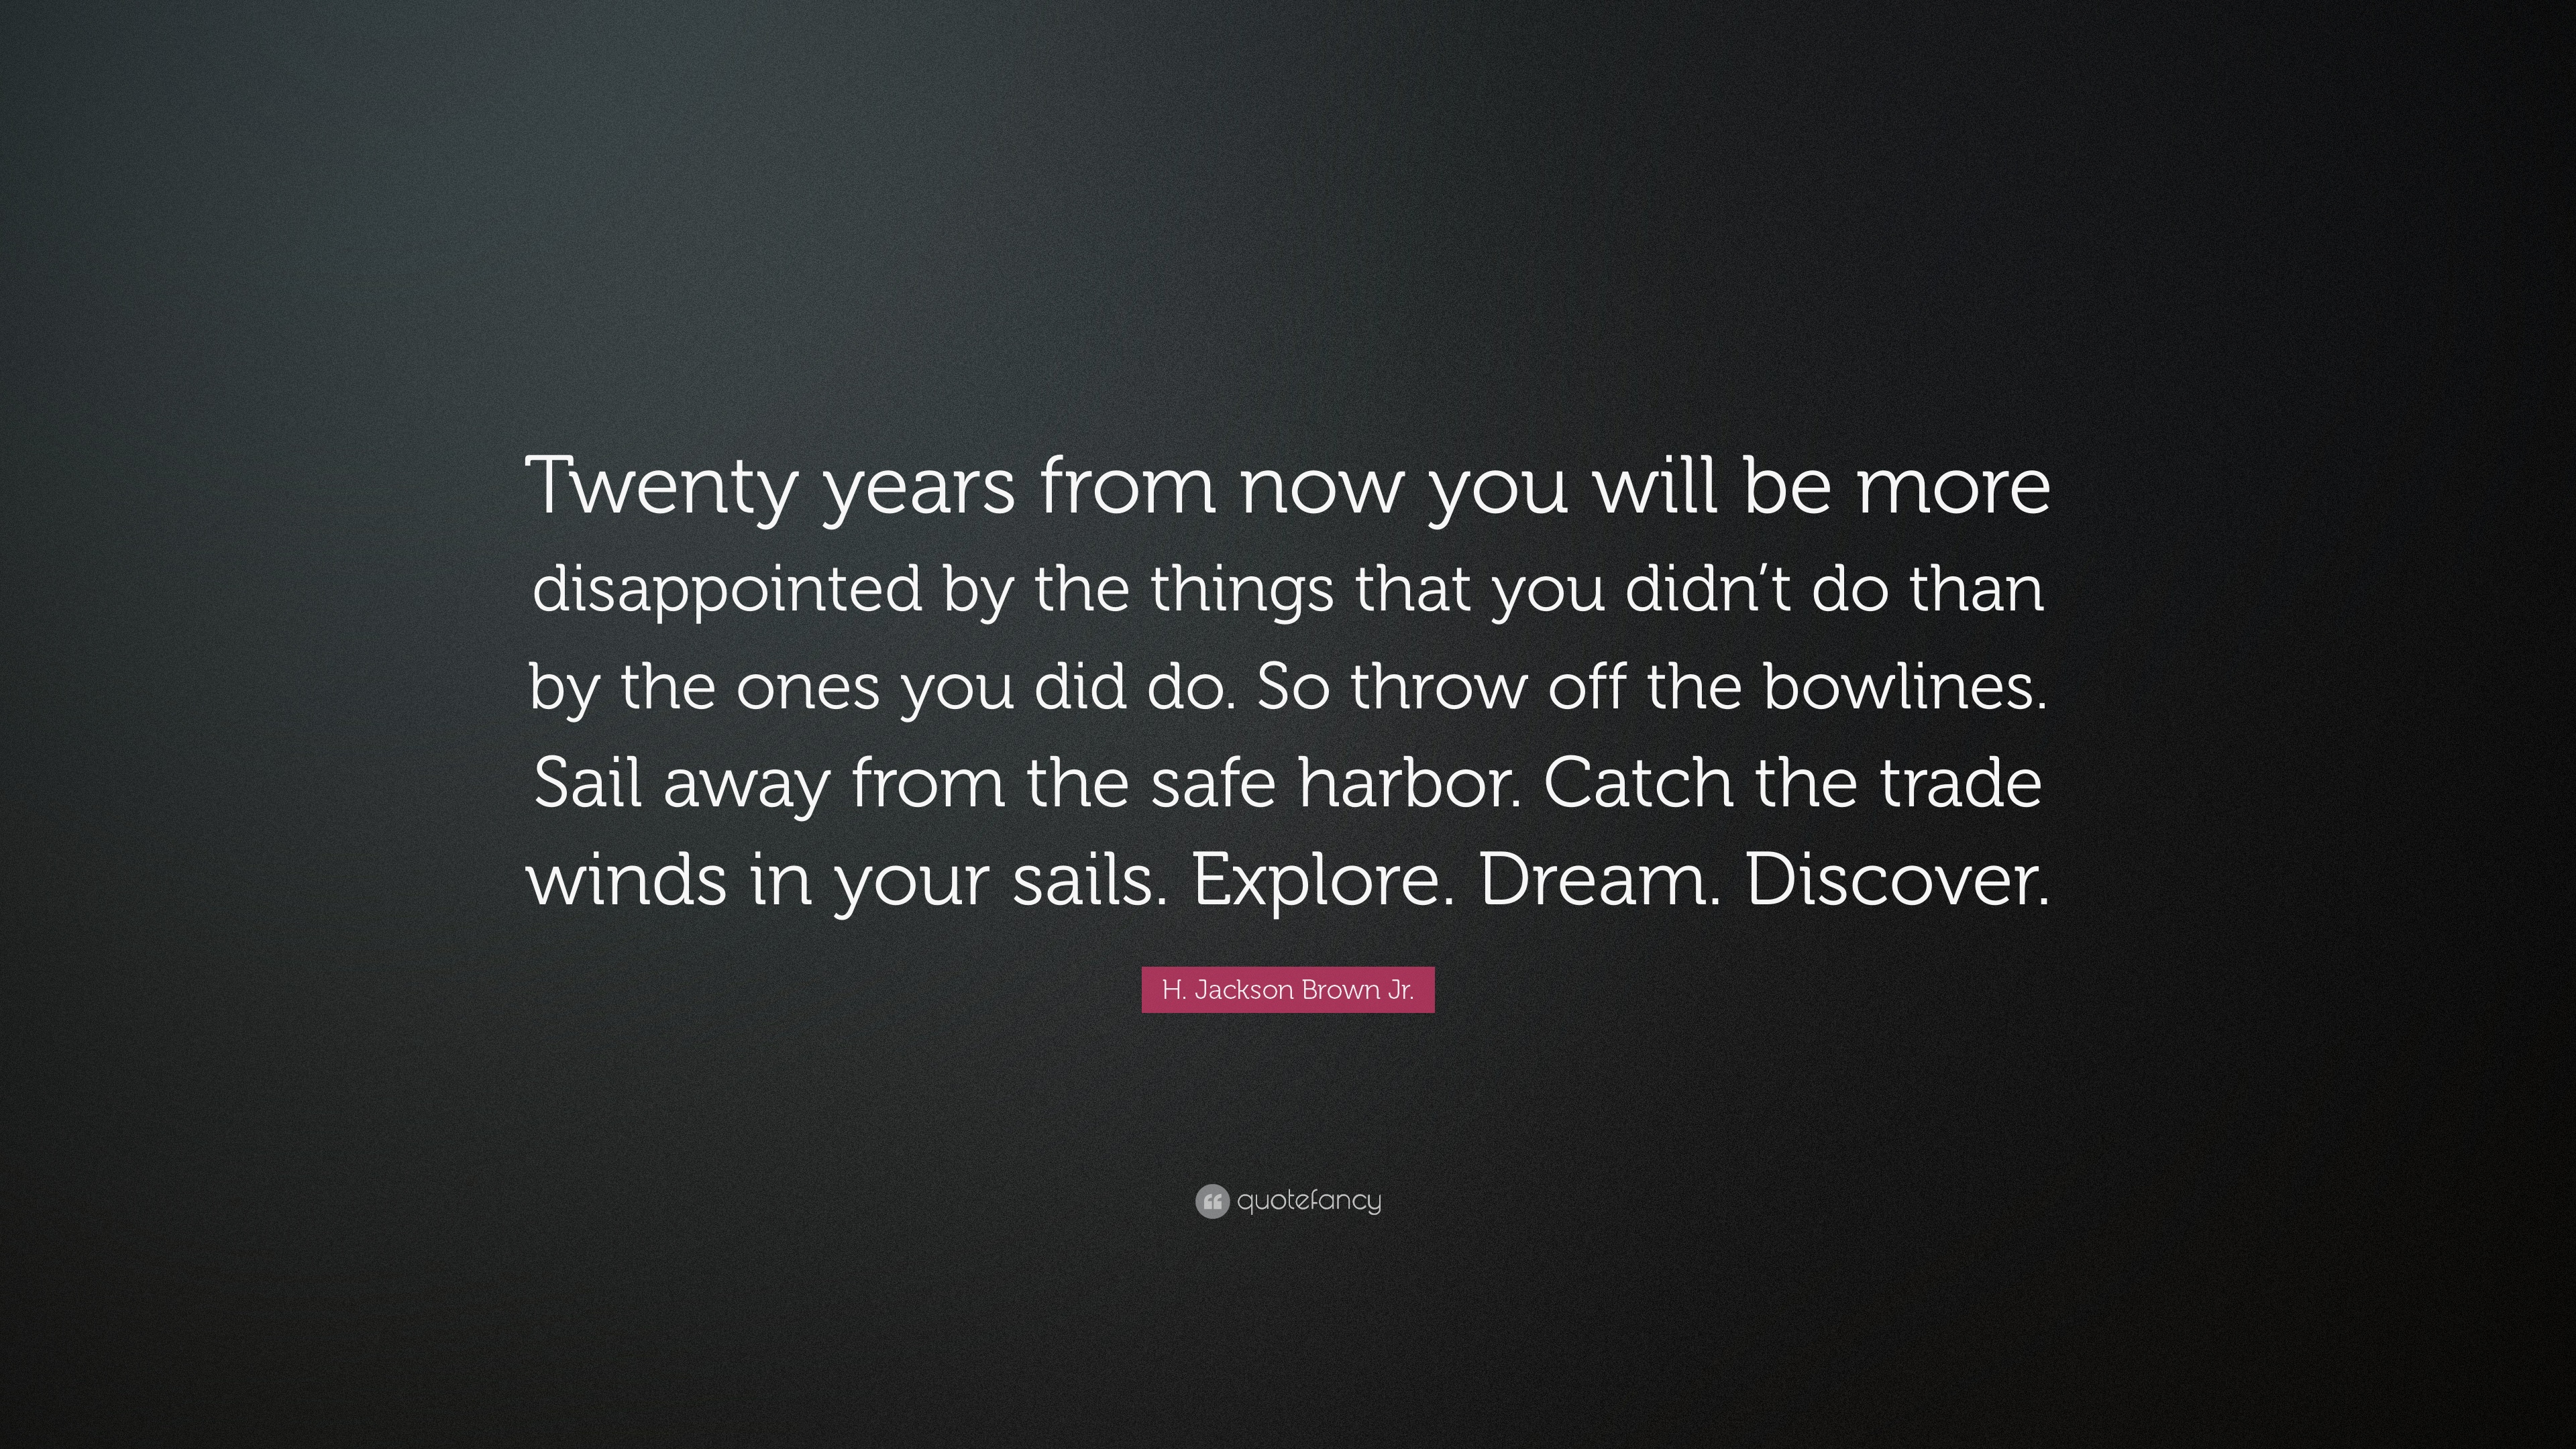 essay twenty years from now